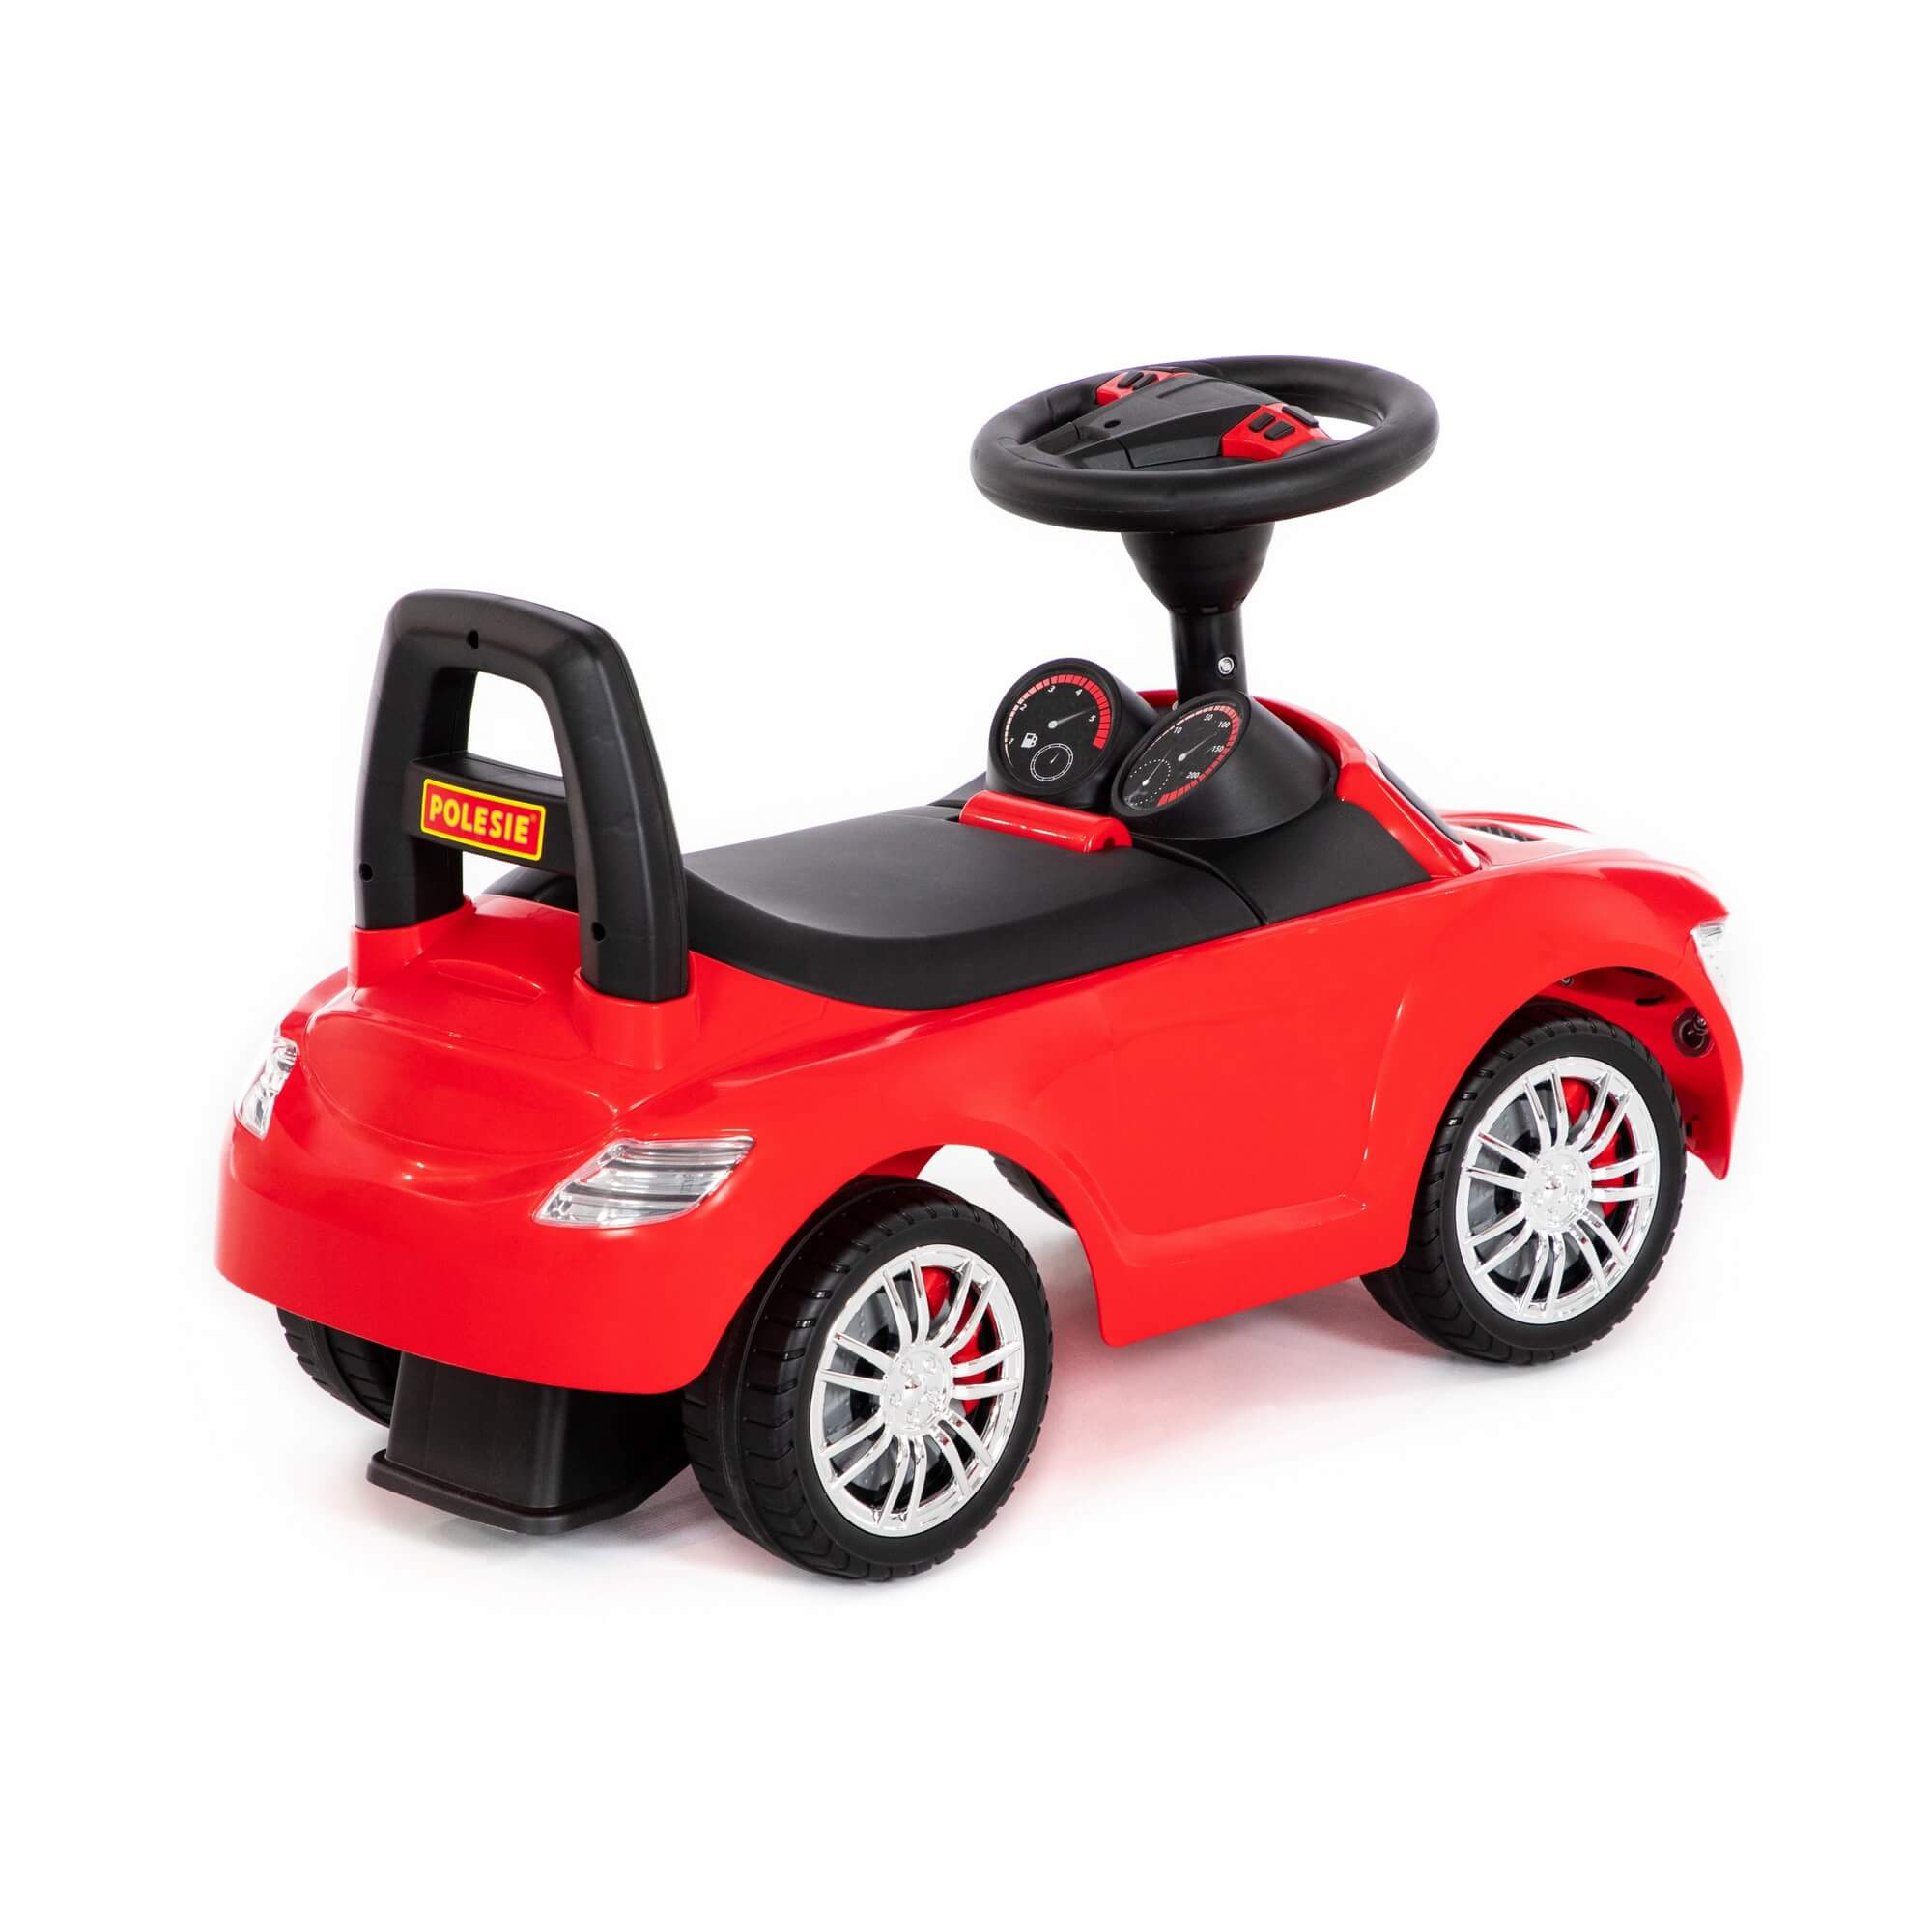 SuperCar sürümeli araba No:1 ses sinyali ile (pembe) Ref. 84460 - photo #4